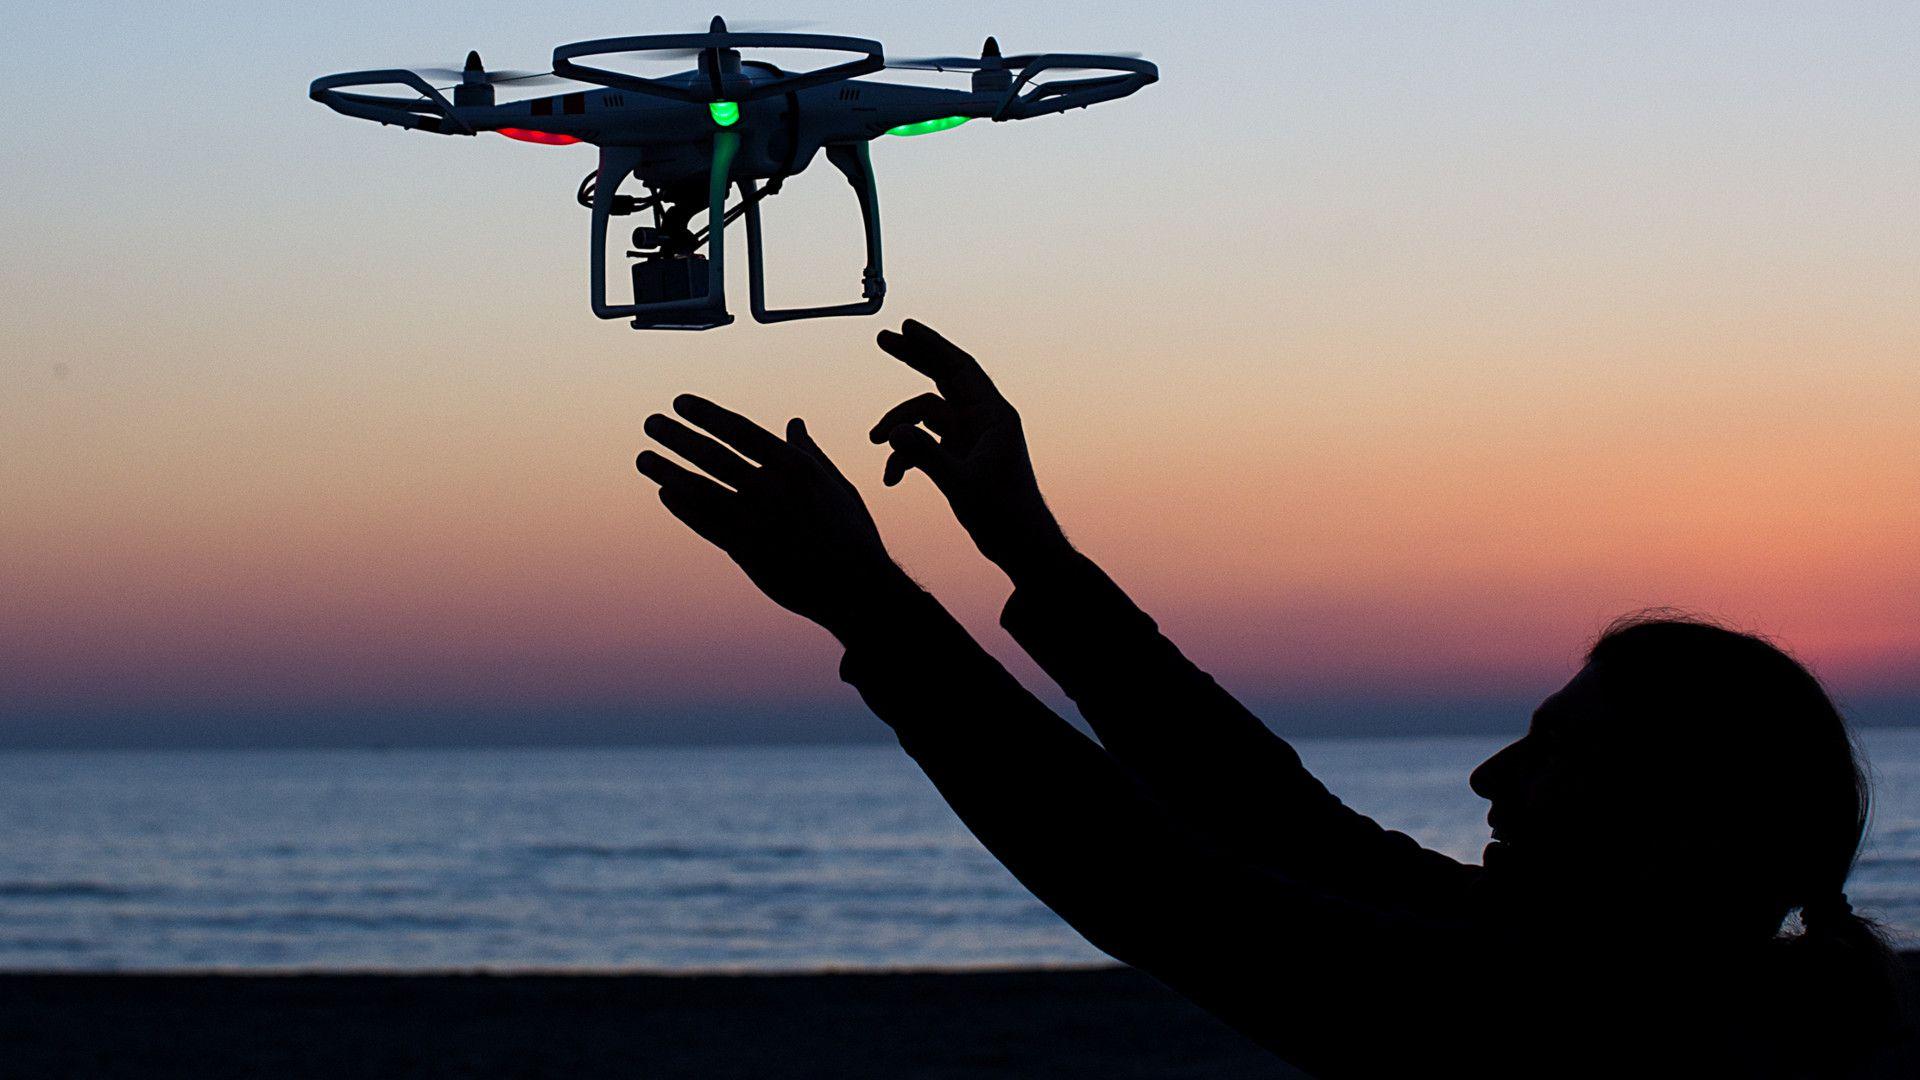 Drone a wallpaper